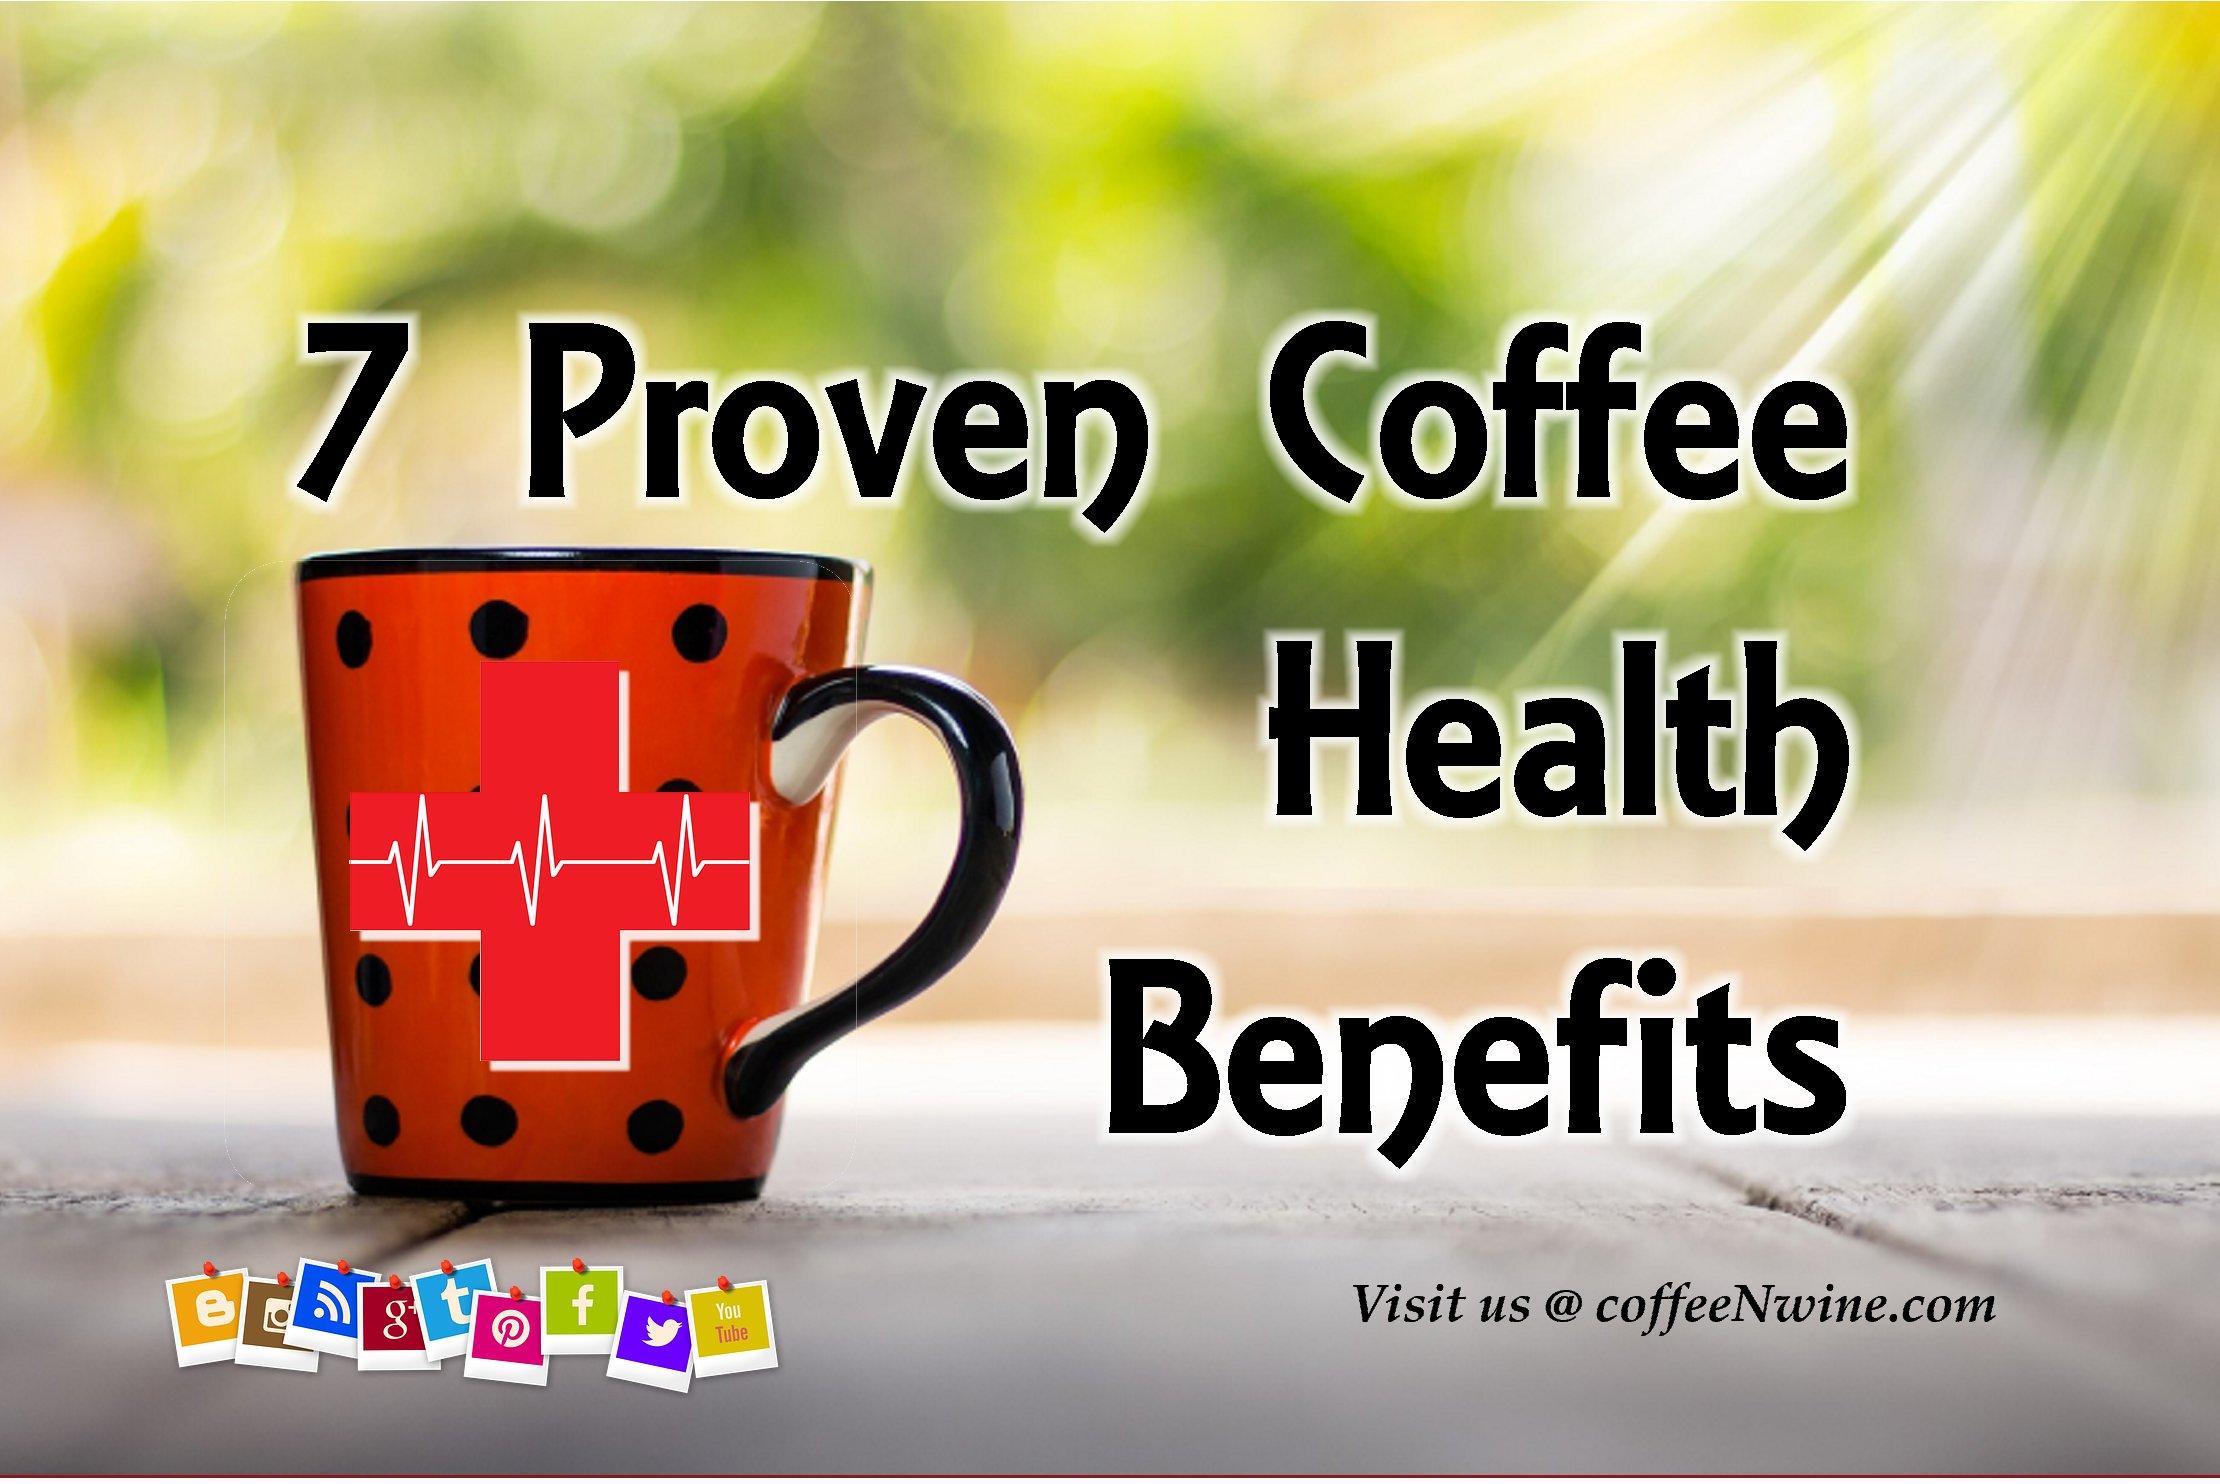 7 Proven Health Benefits of Coffee